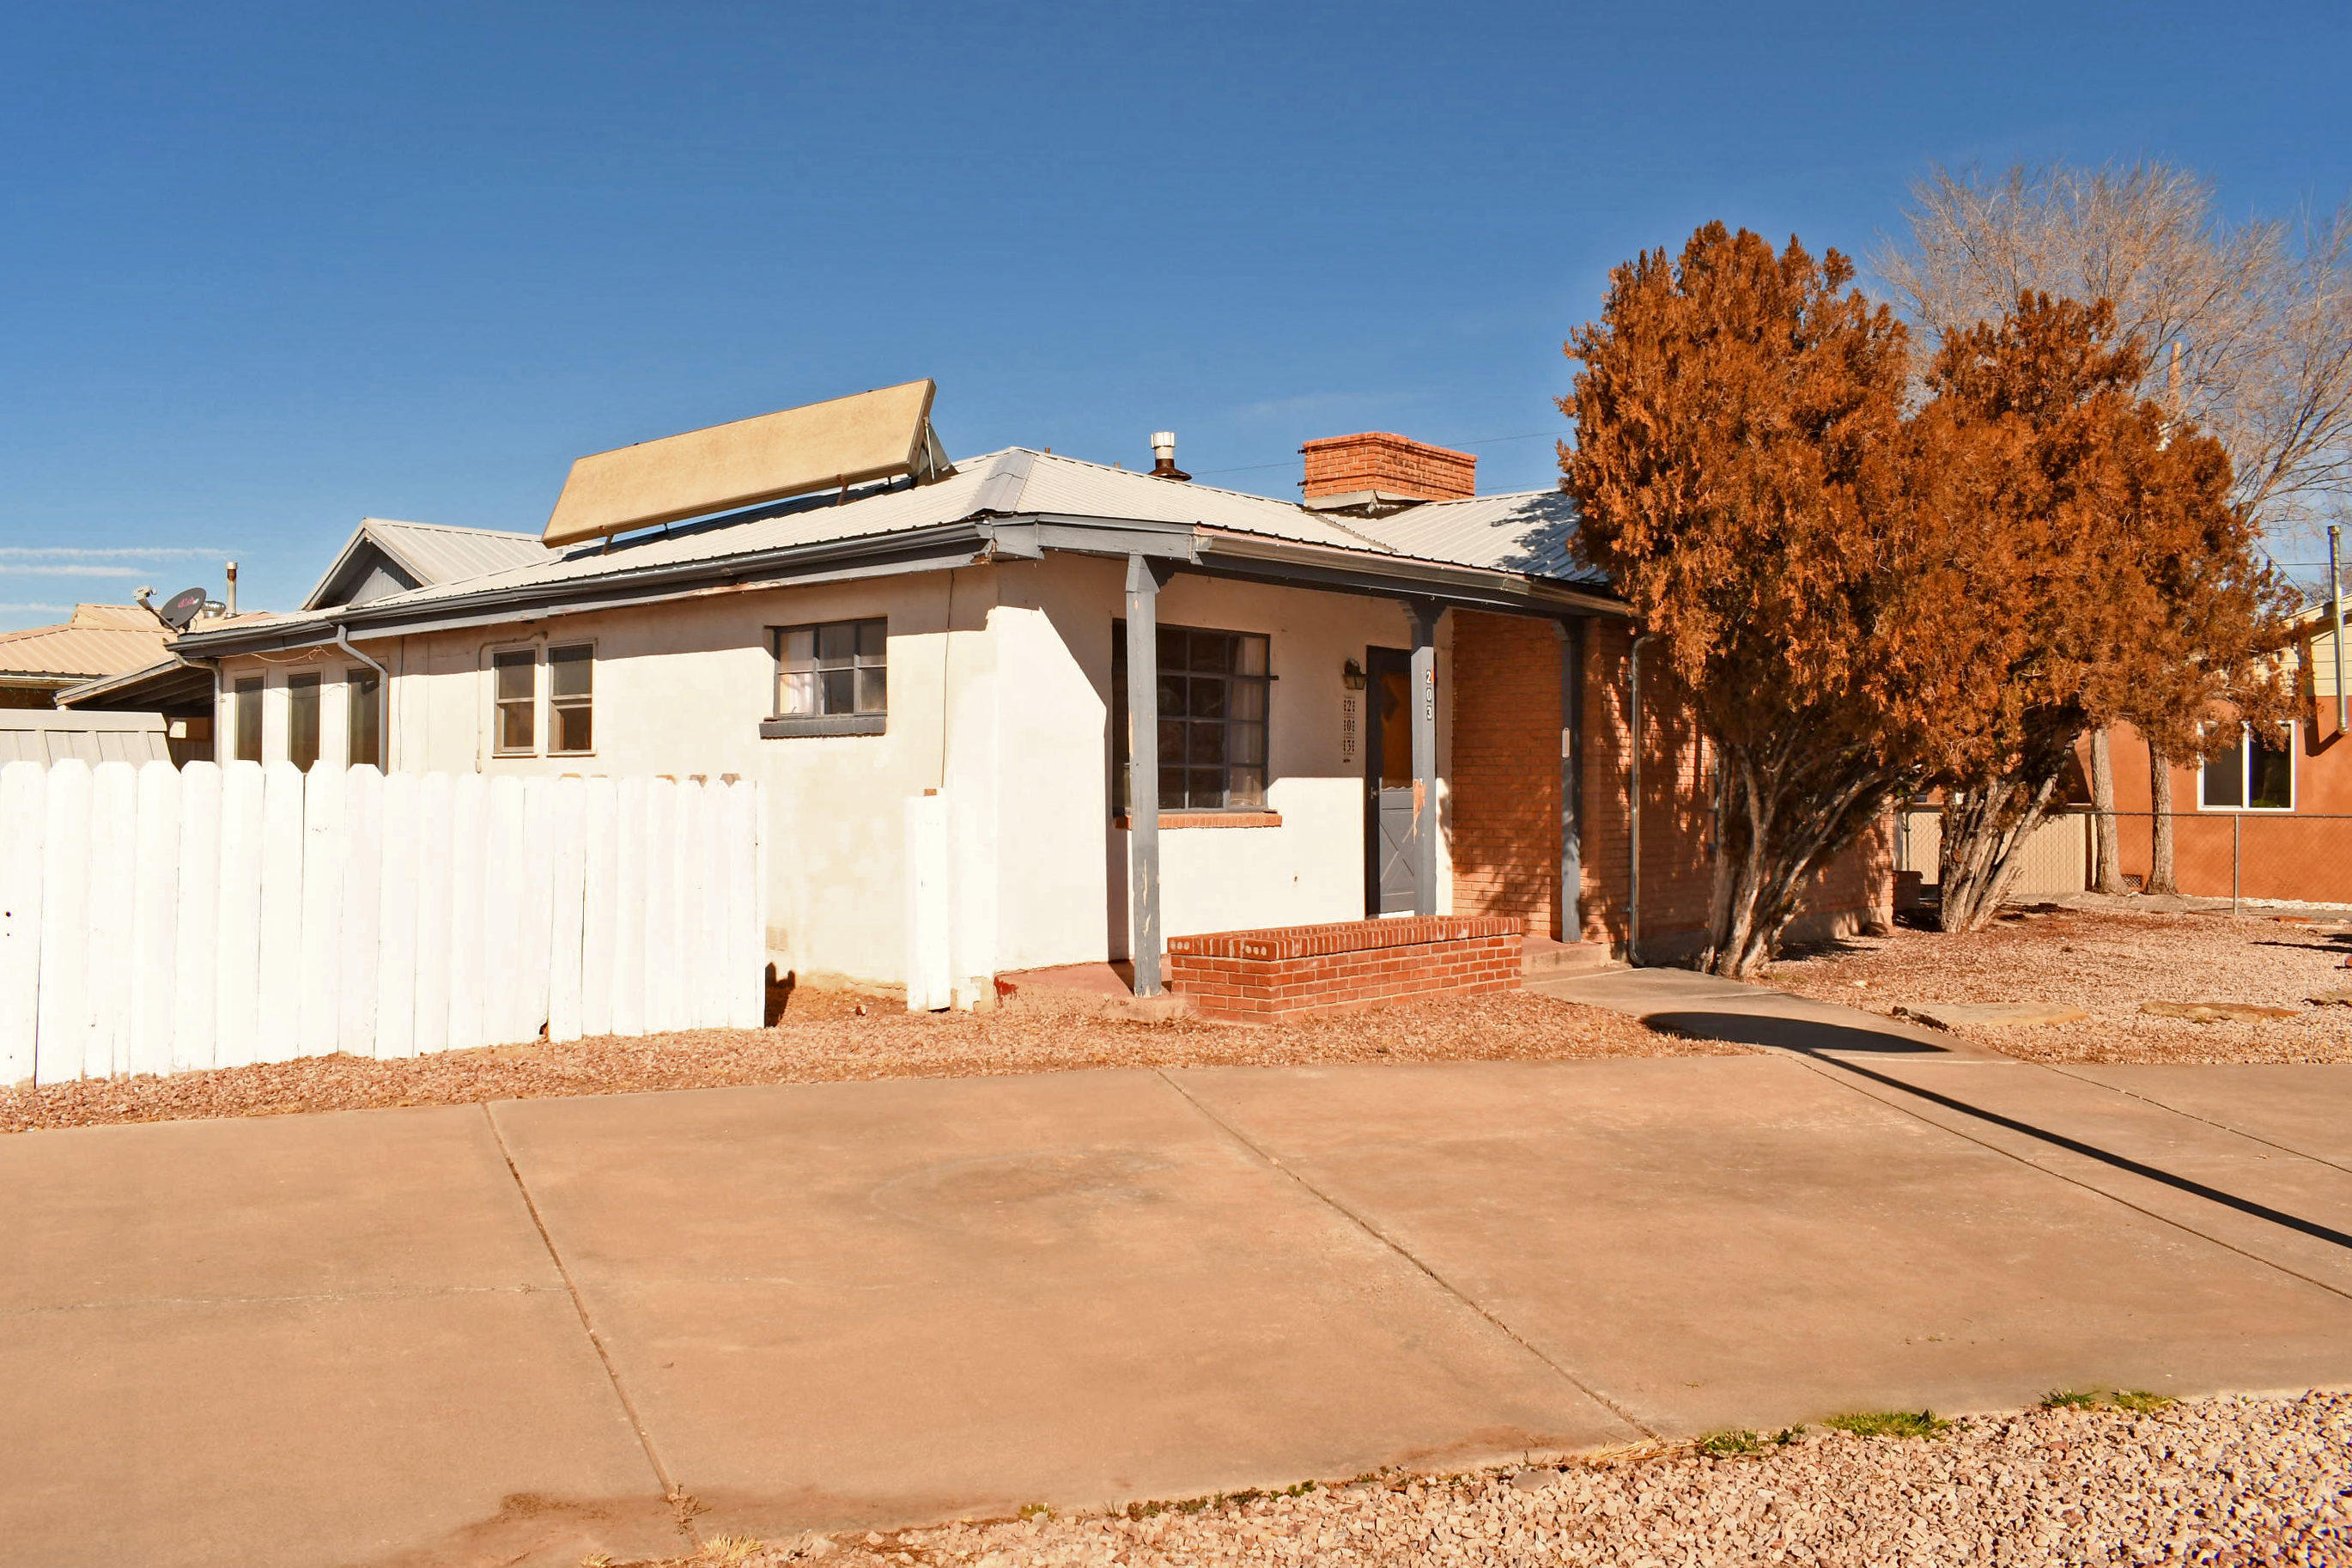 203 NIMITZ Drive, Grants, NM 87020 - Grants, NM real estate listing